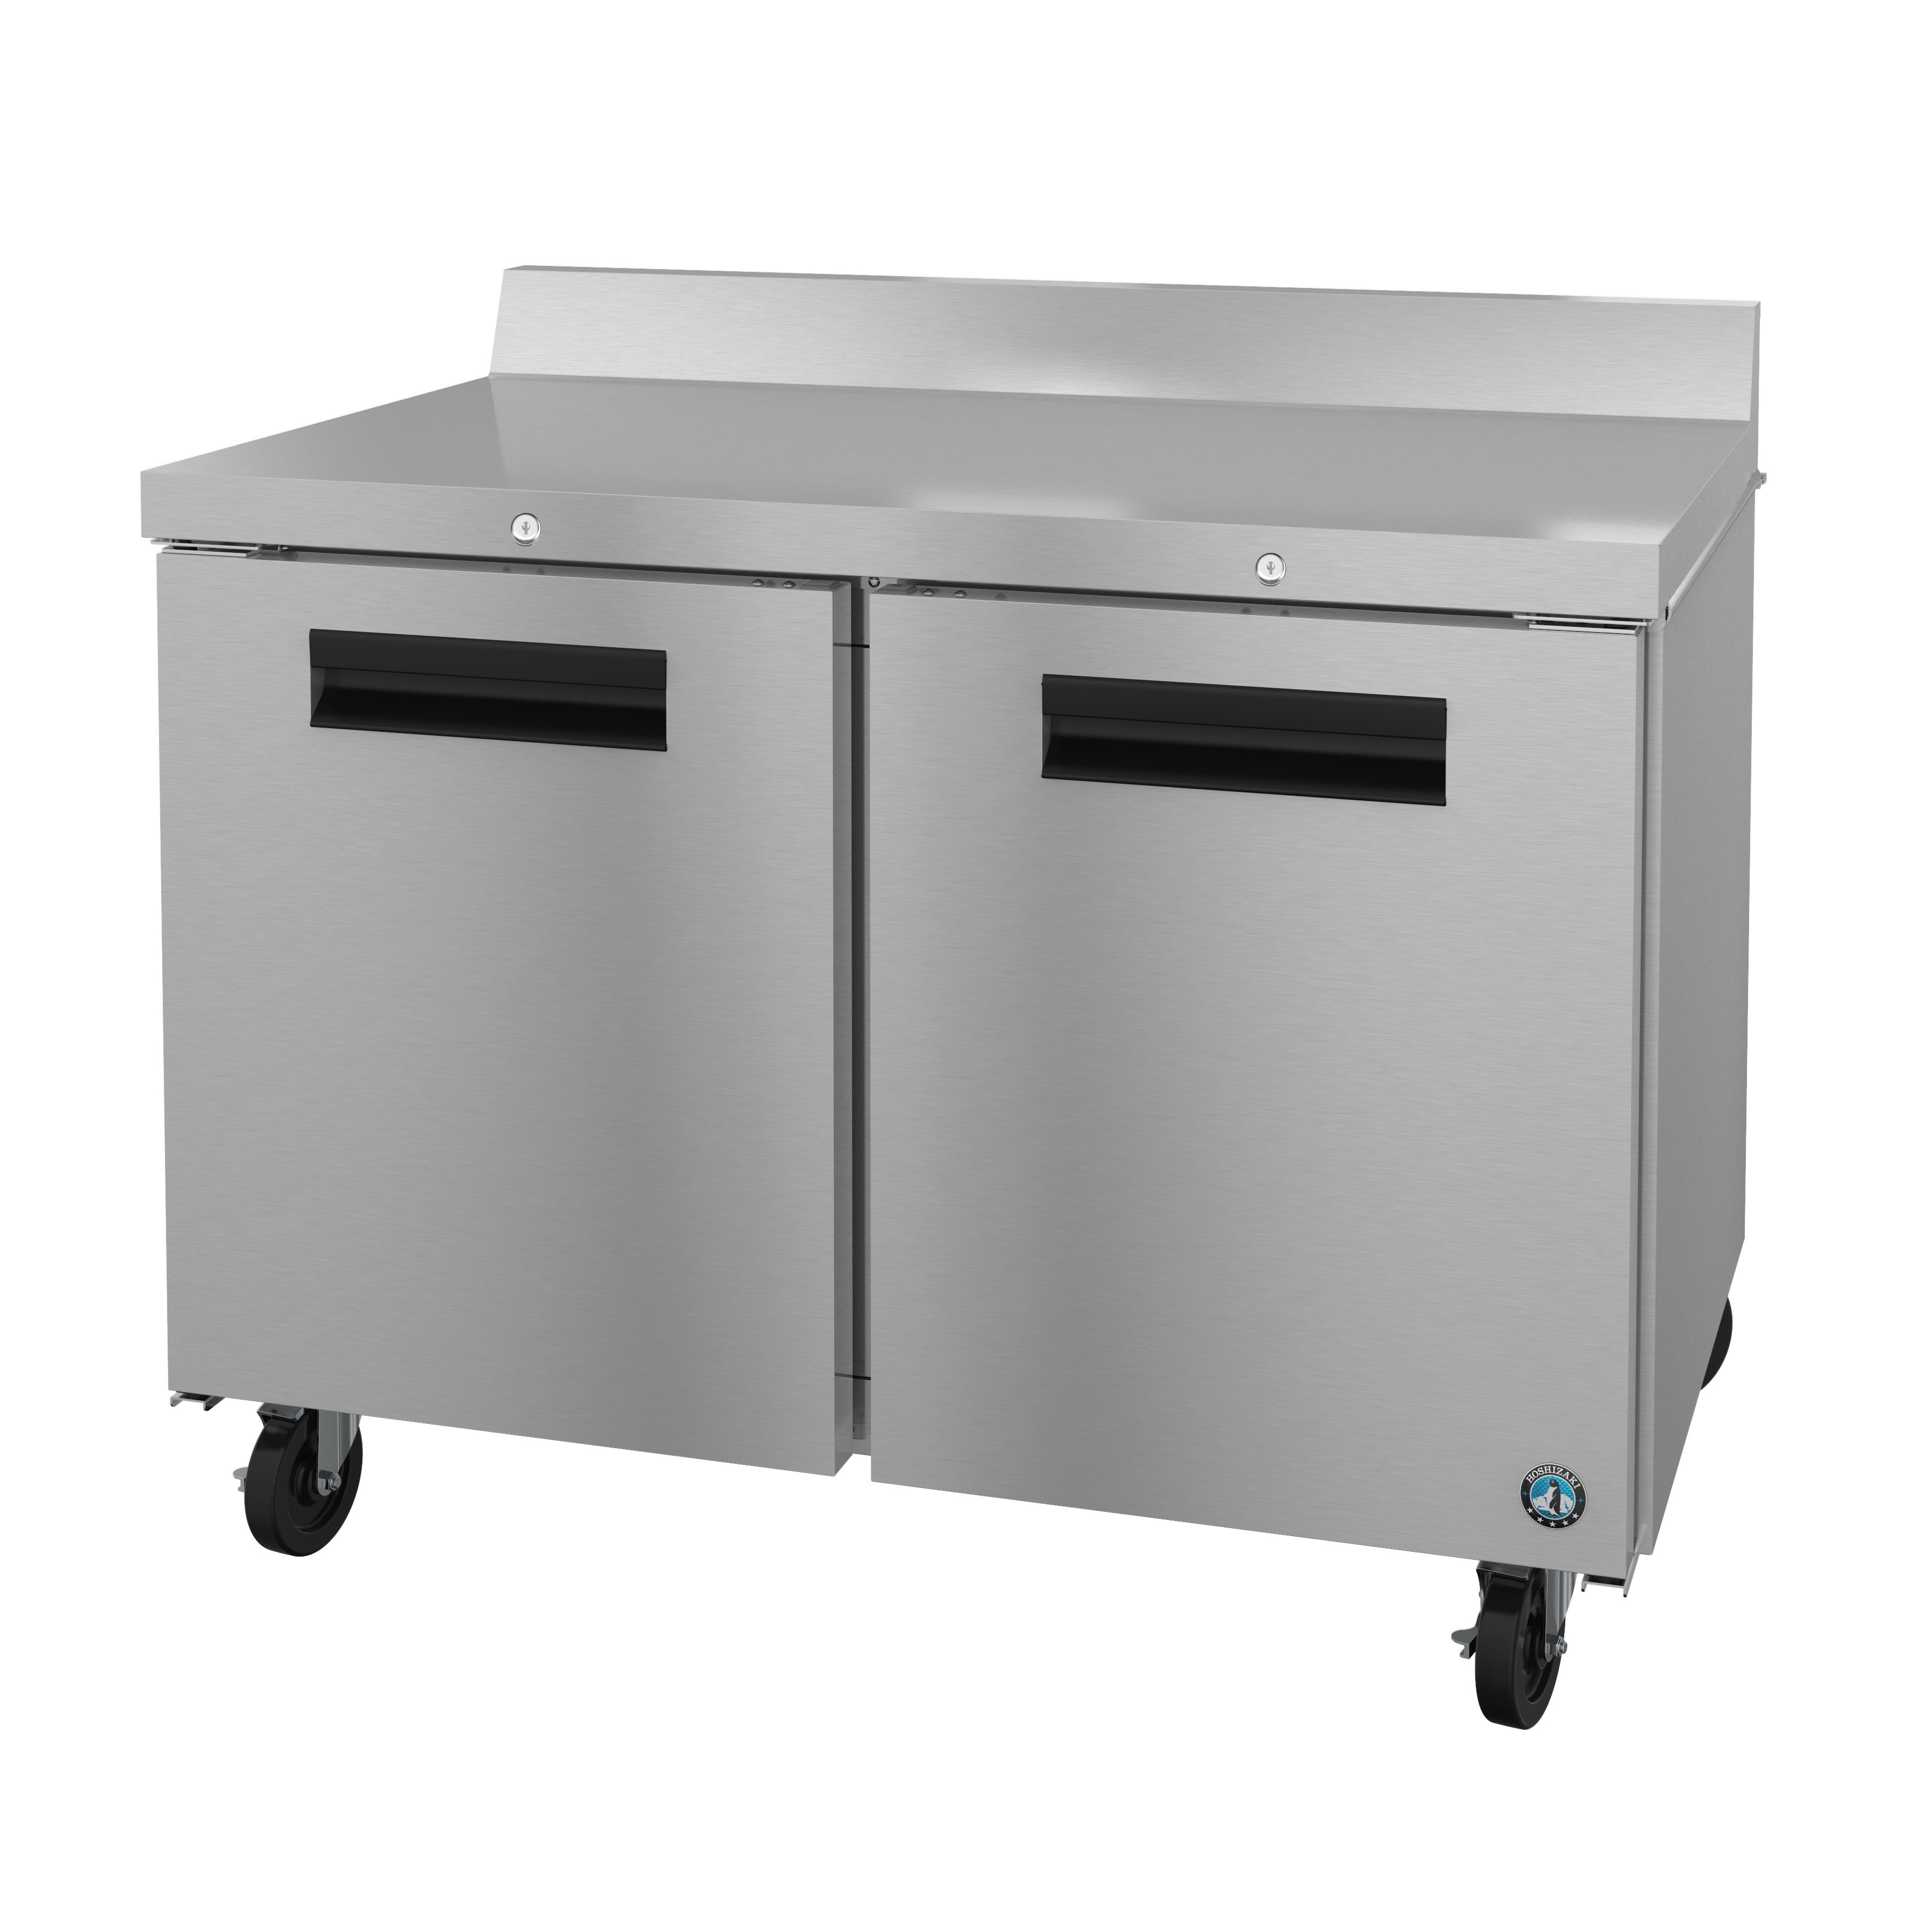 Hoshizaki WR48A-01 refrigerated counter, work top